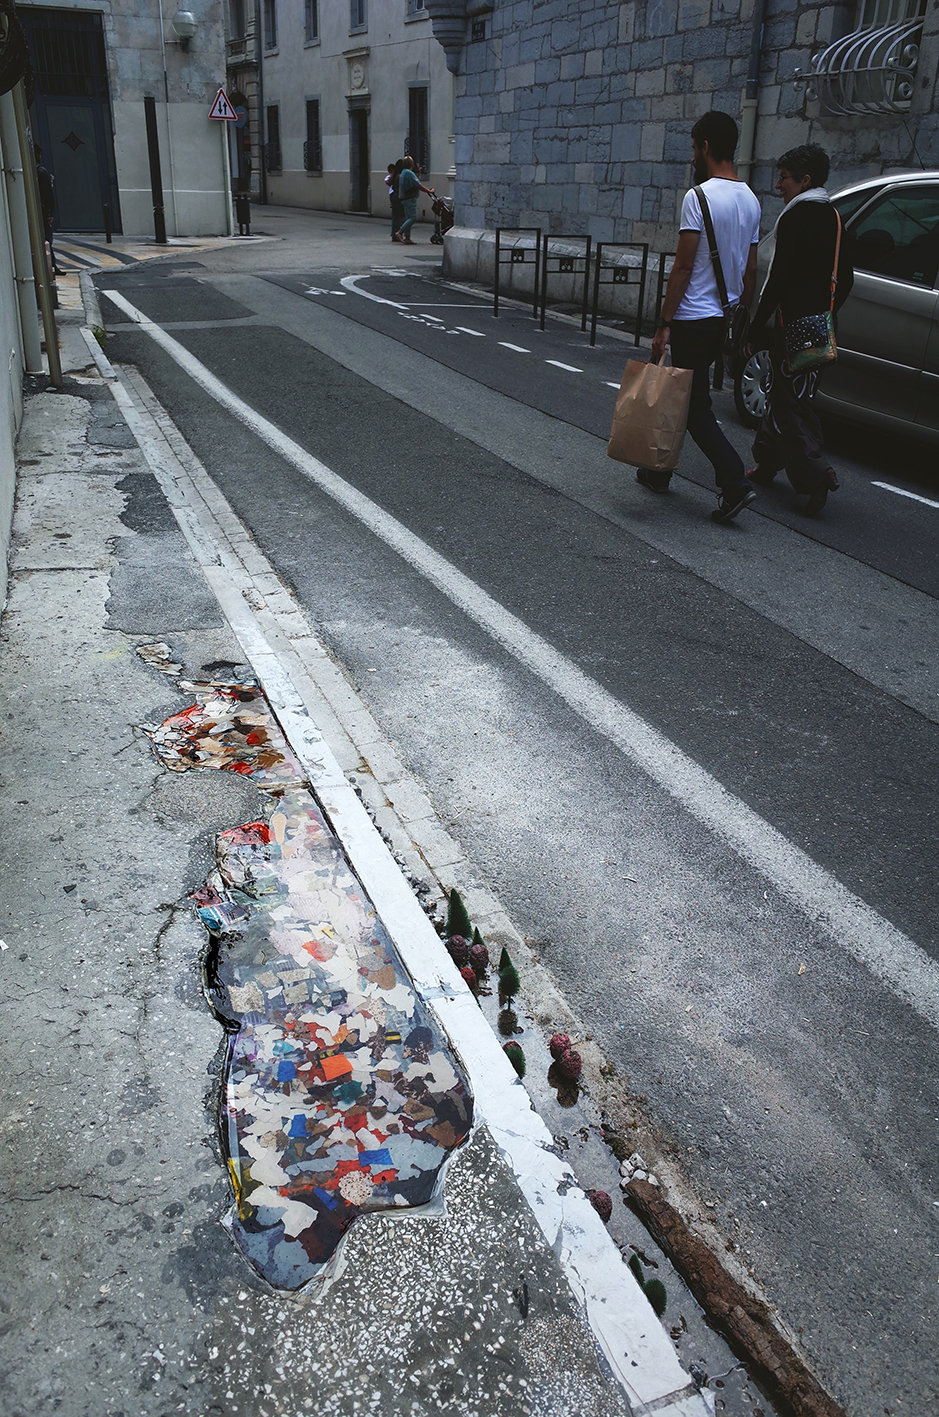 Materials on street 07